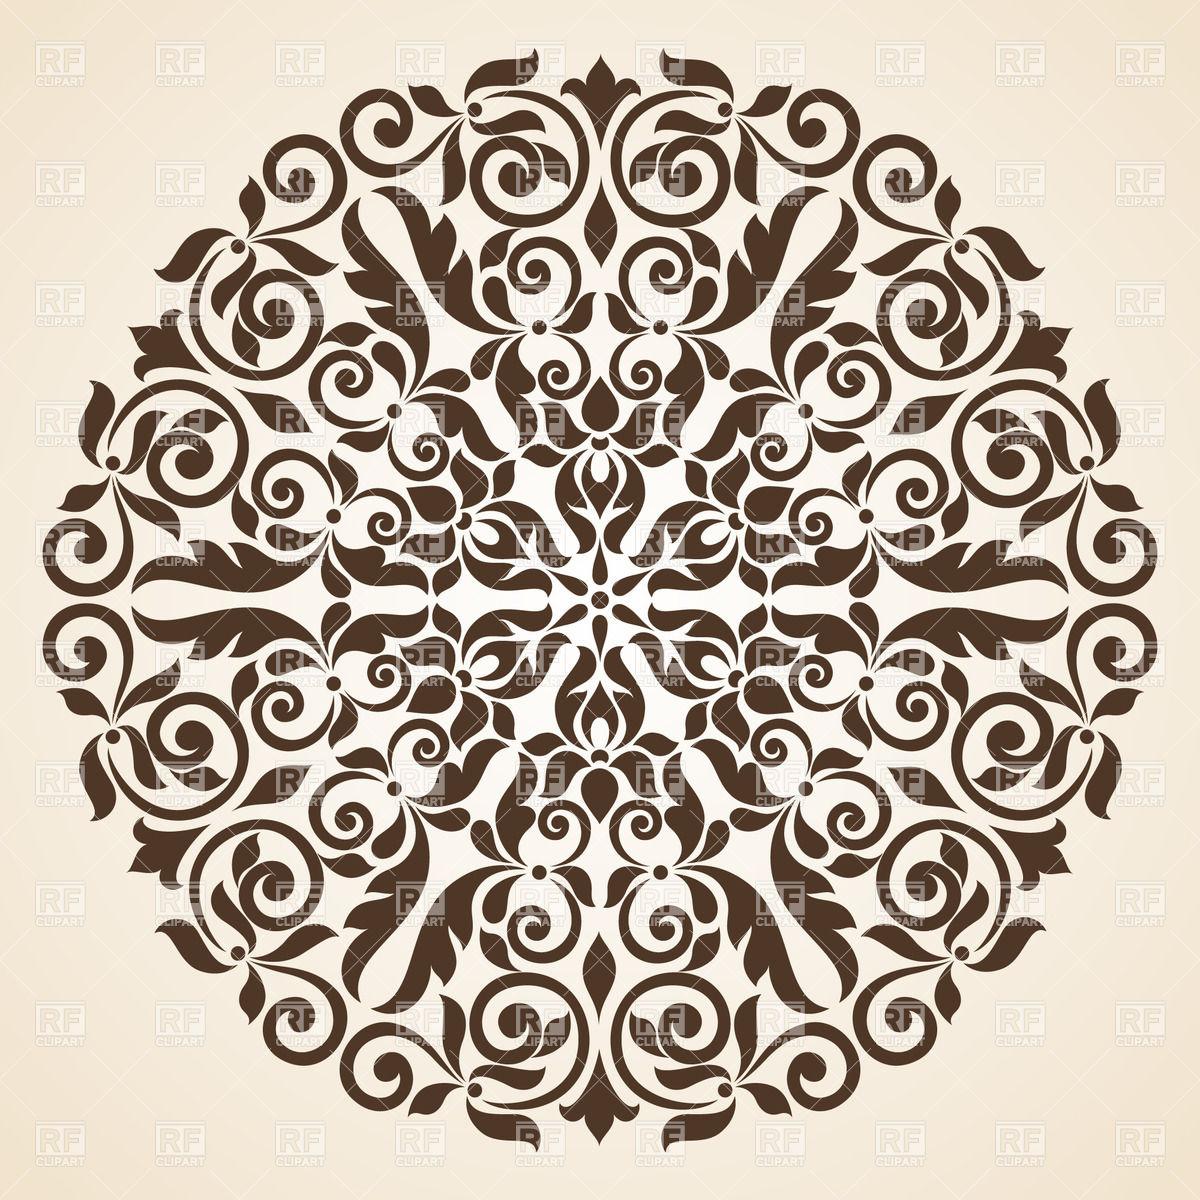 1200x1200 Round Brown Kaleidoscopic Ornament Vector Image Vector Artwork